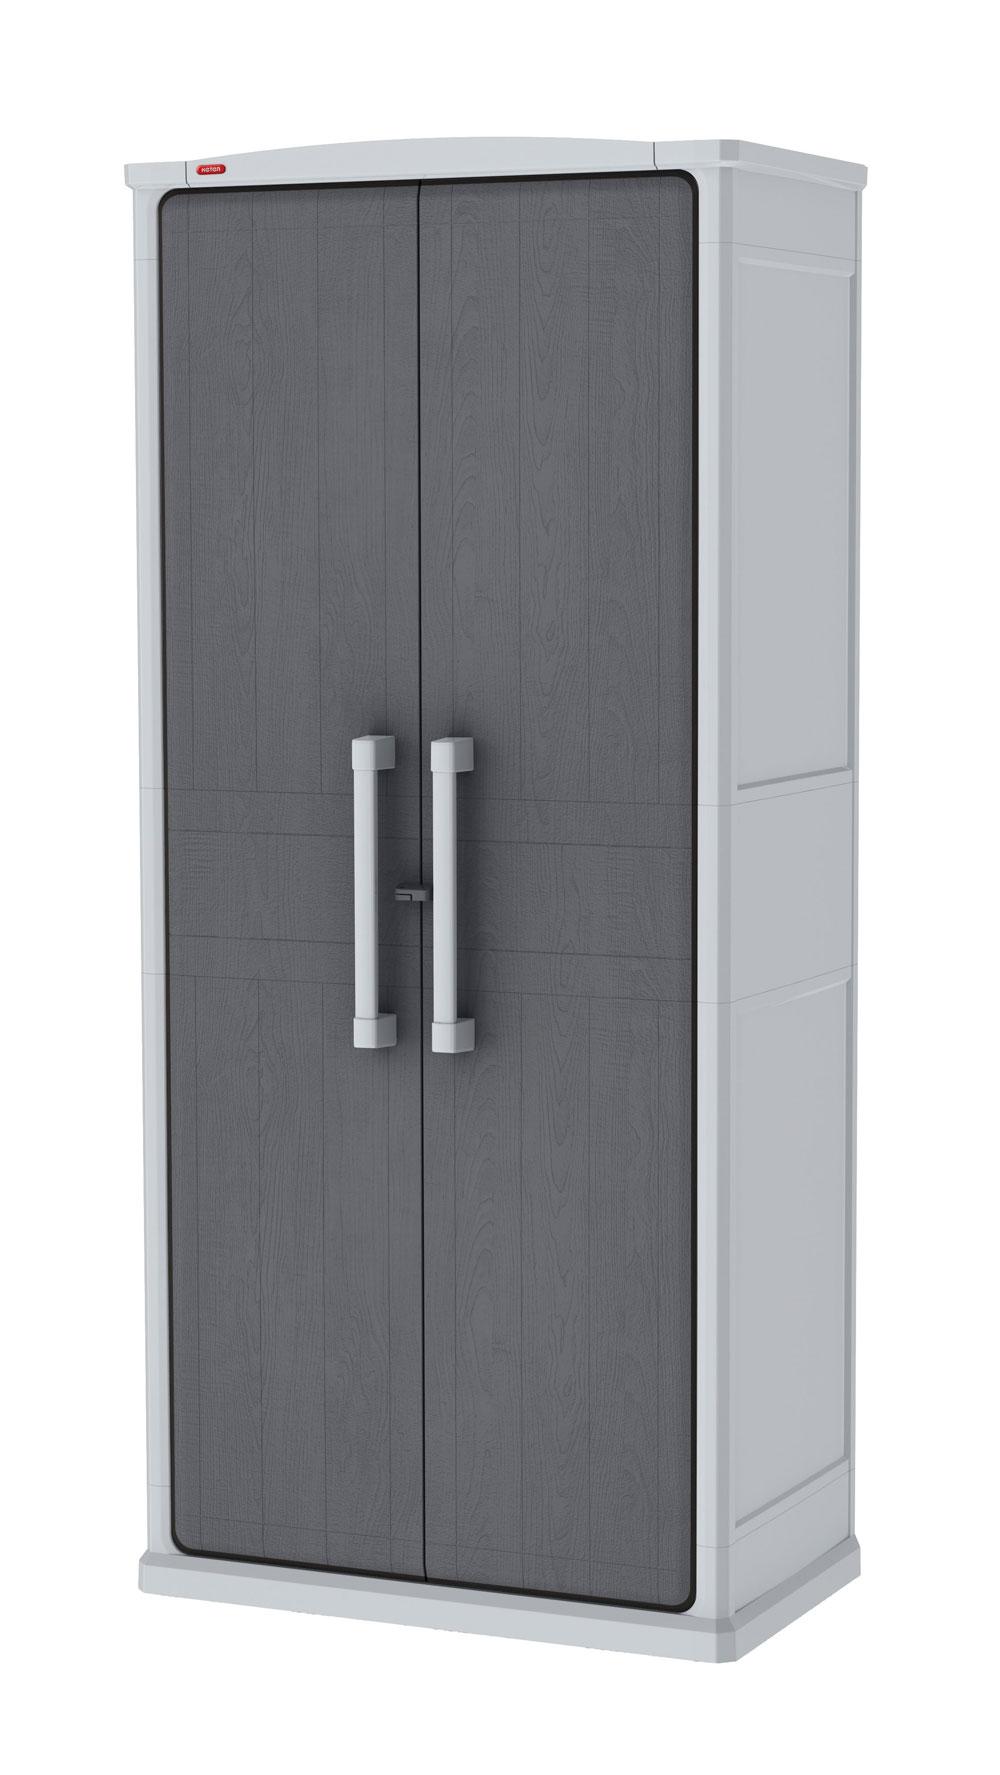 Gartenschrank Keter Optima Wonder Cabinet Tall 80,5x47,3x177,8cm grau Bild 2